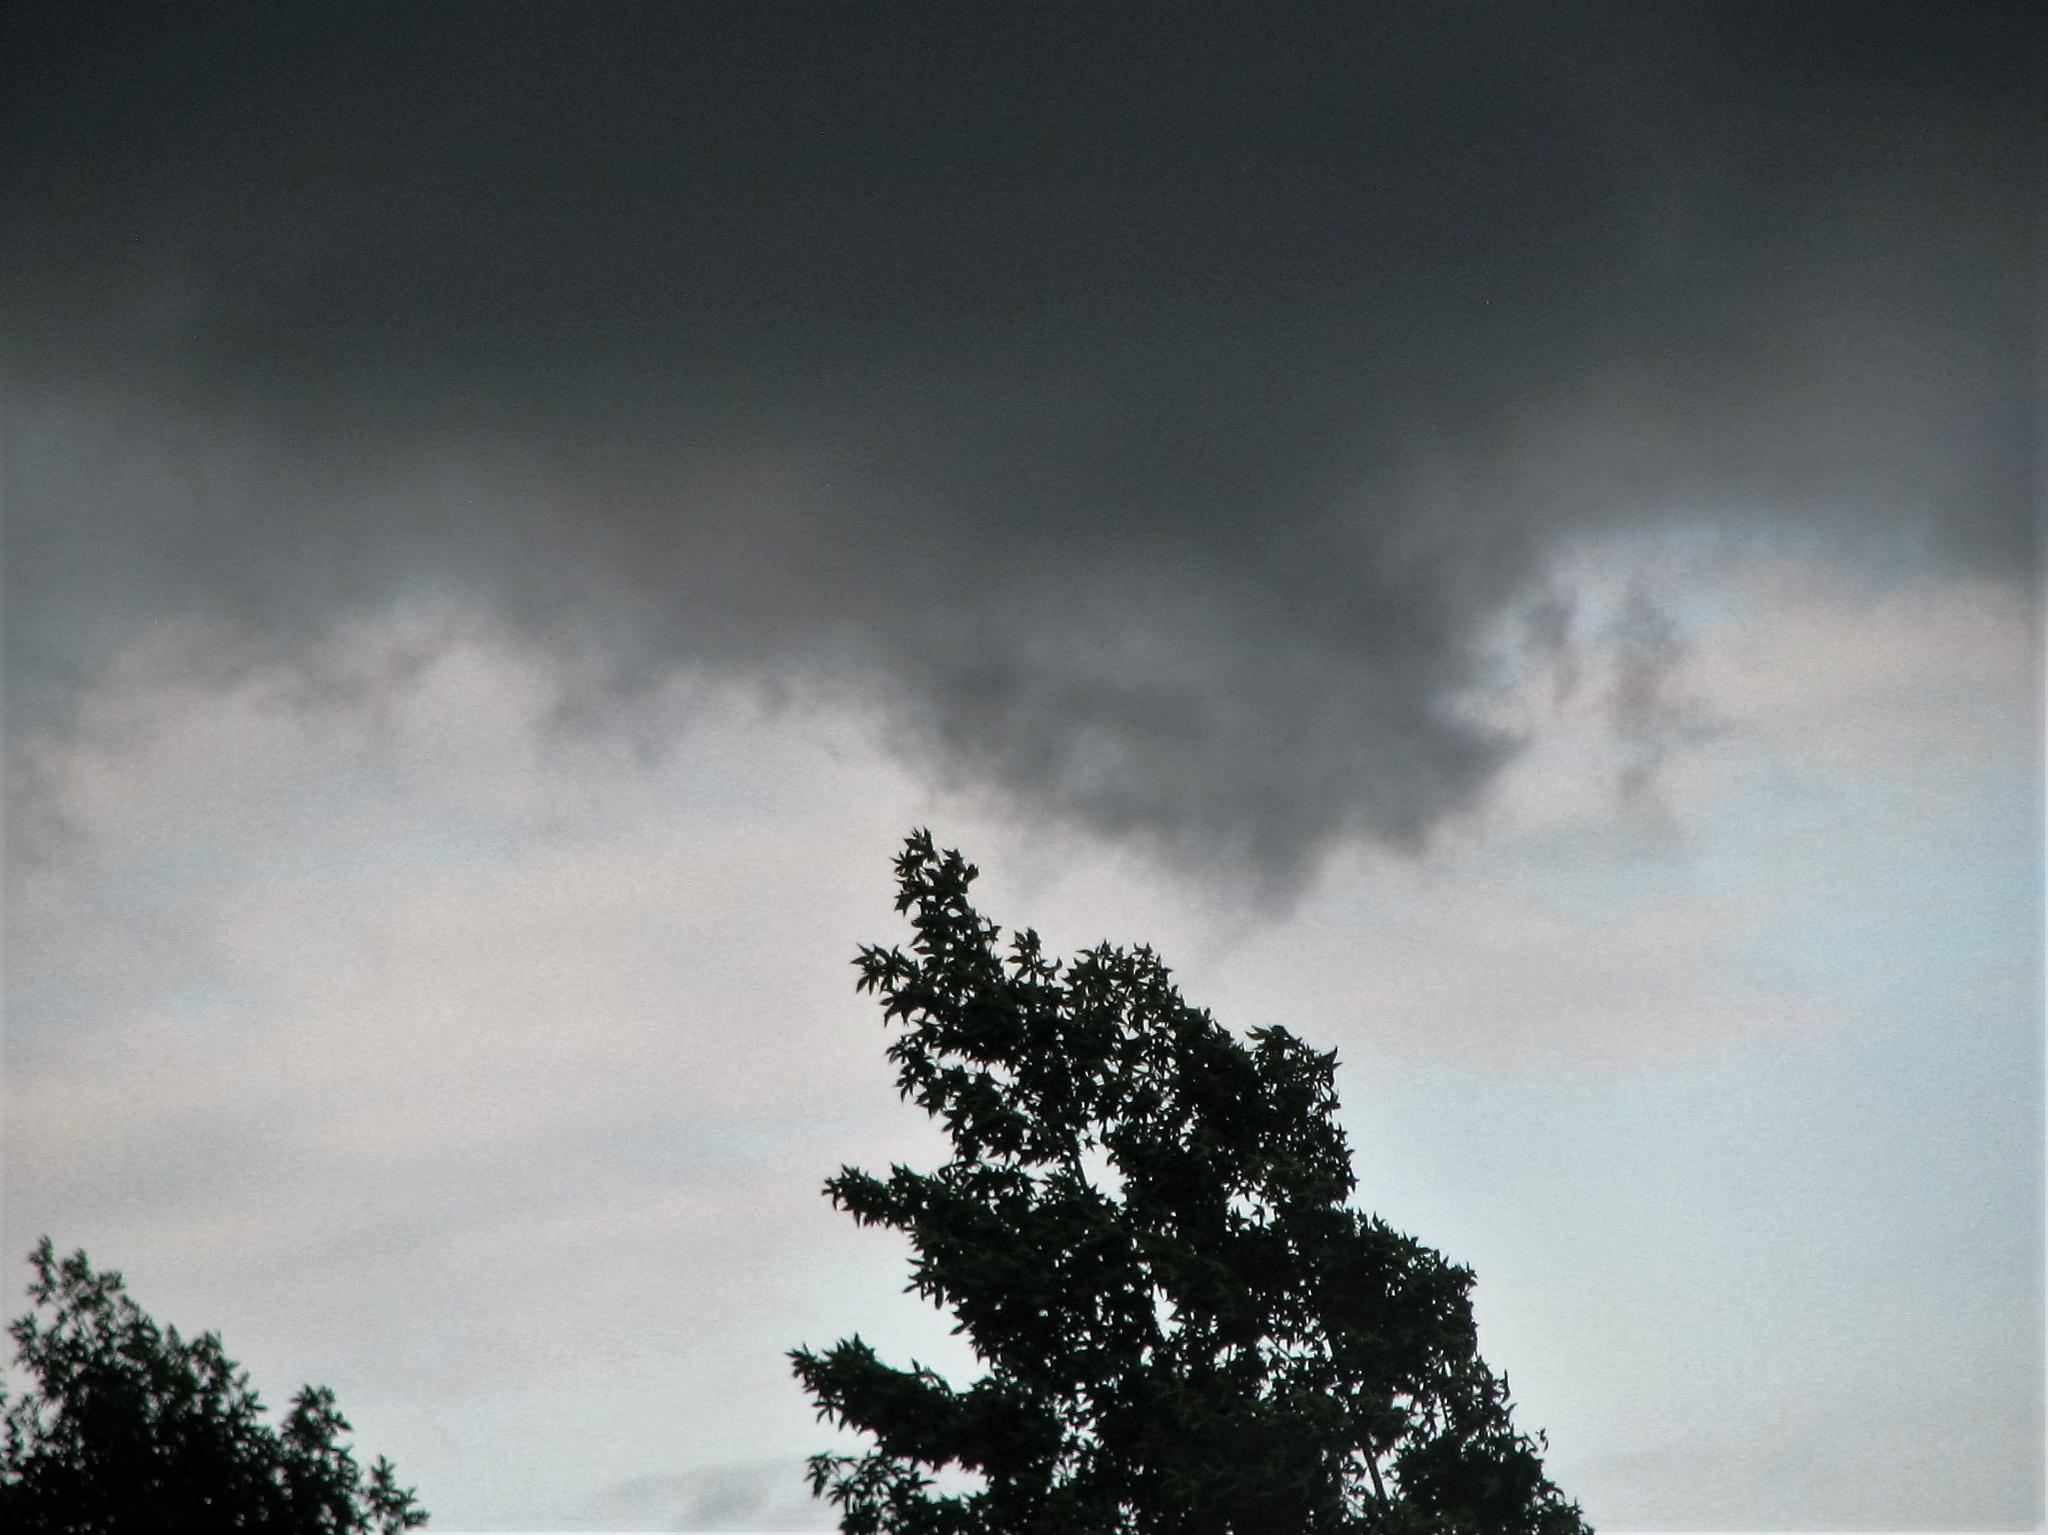 Stormy Evening 1 by nelda.sue